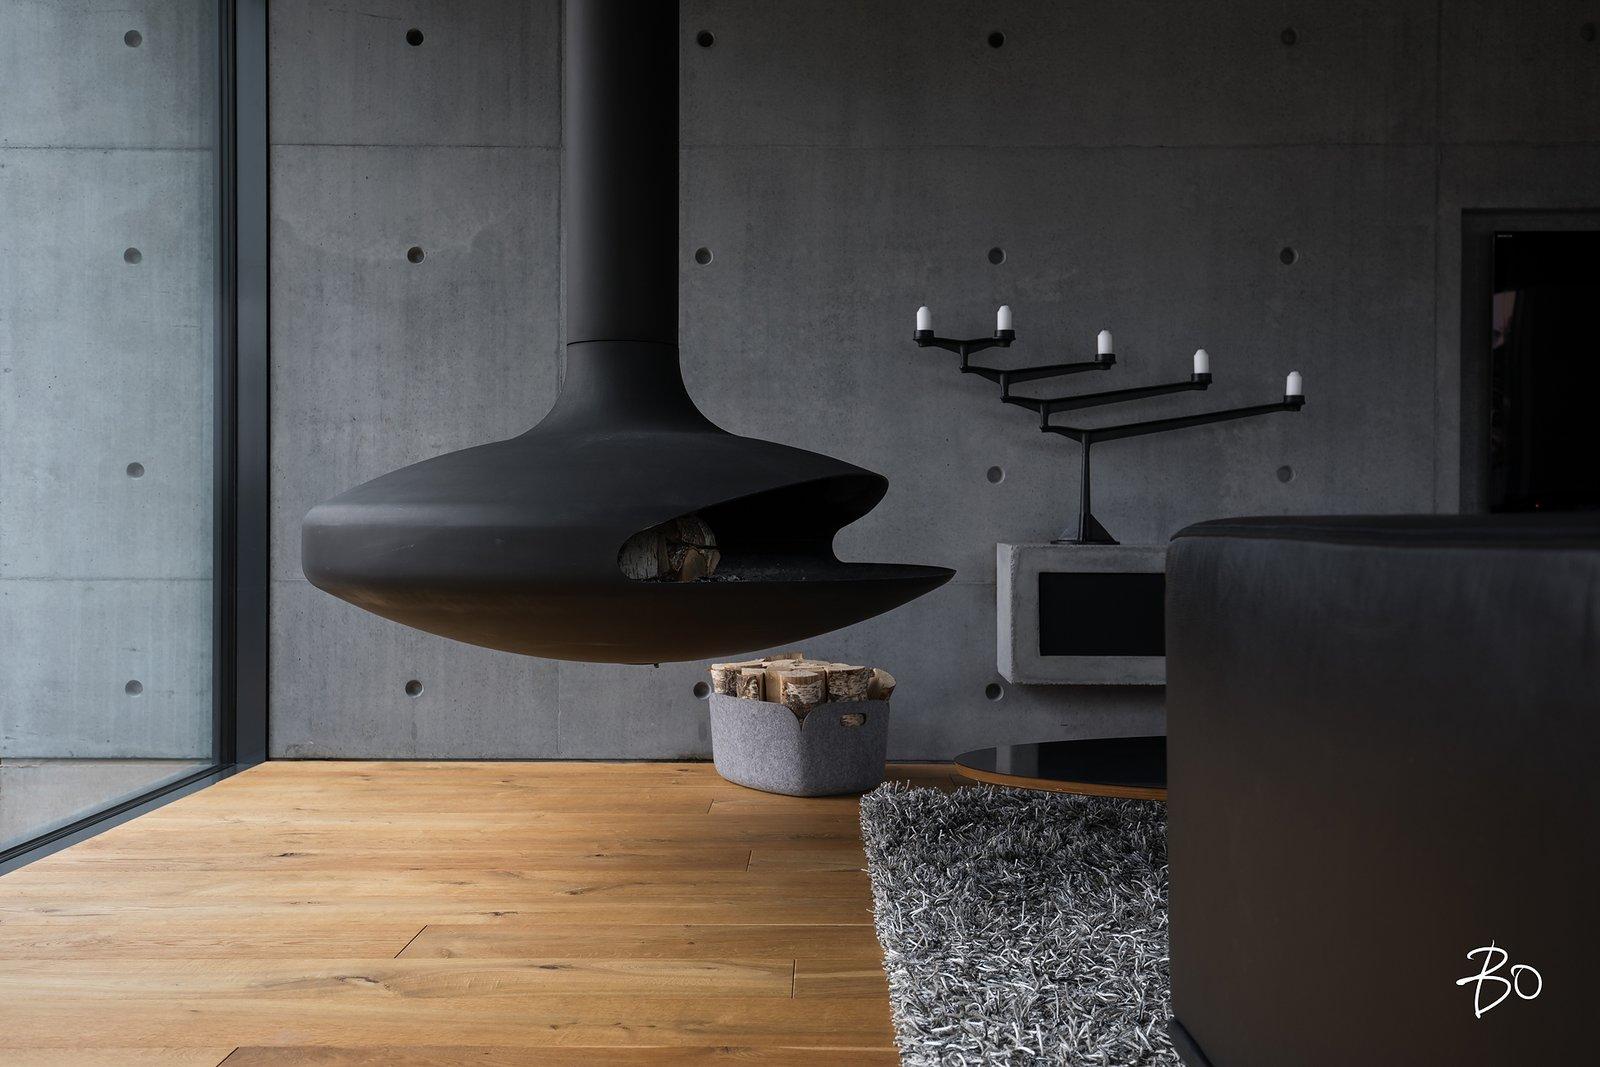 Living room fireplace / Gyrofocus  (Dominique Imbert 1968)  villAma